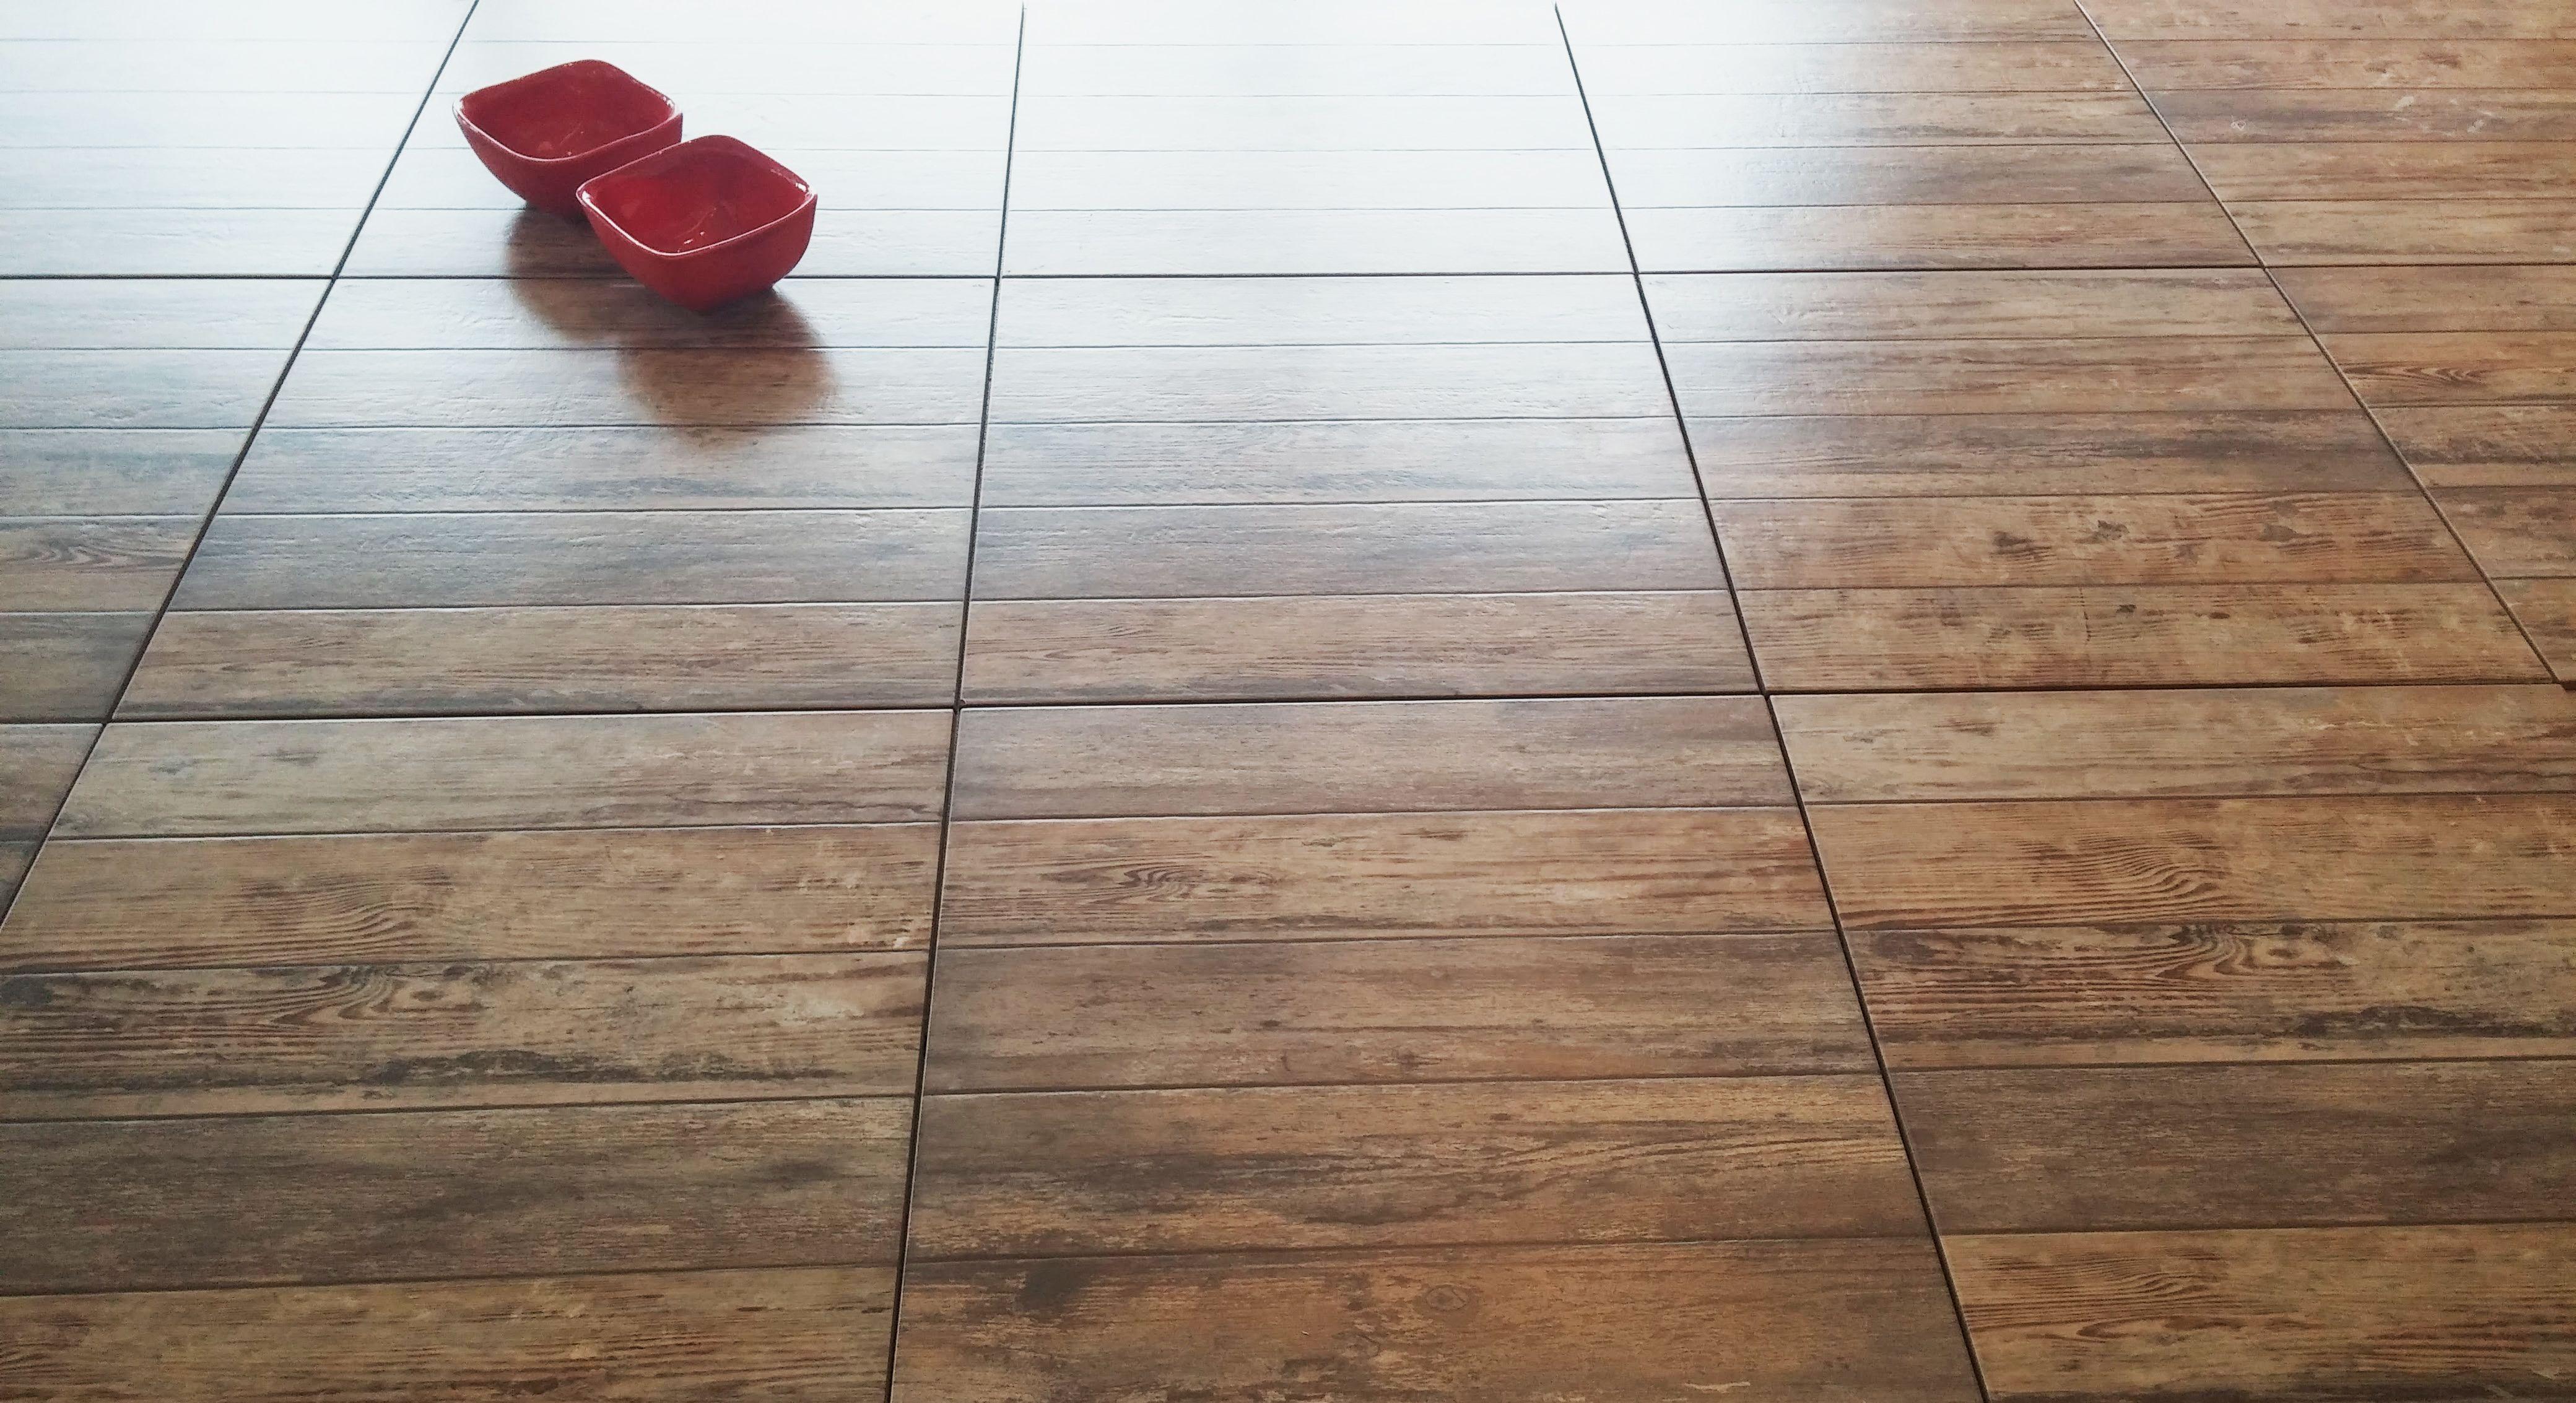 Piso listn rstico 453x453 ideas pinterest piso listn rstico 453x453 dailygadgetfo Choice Image